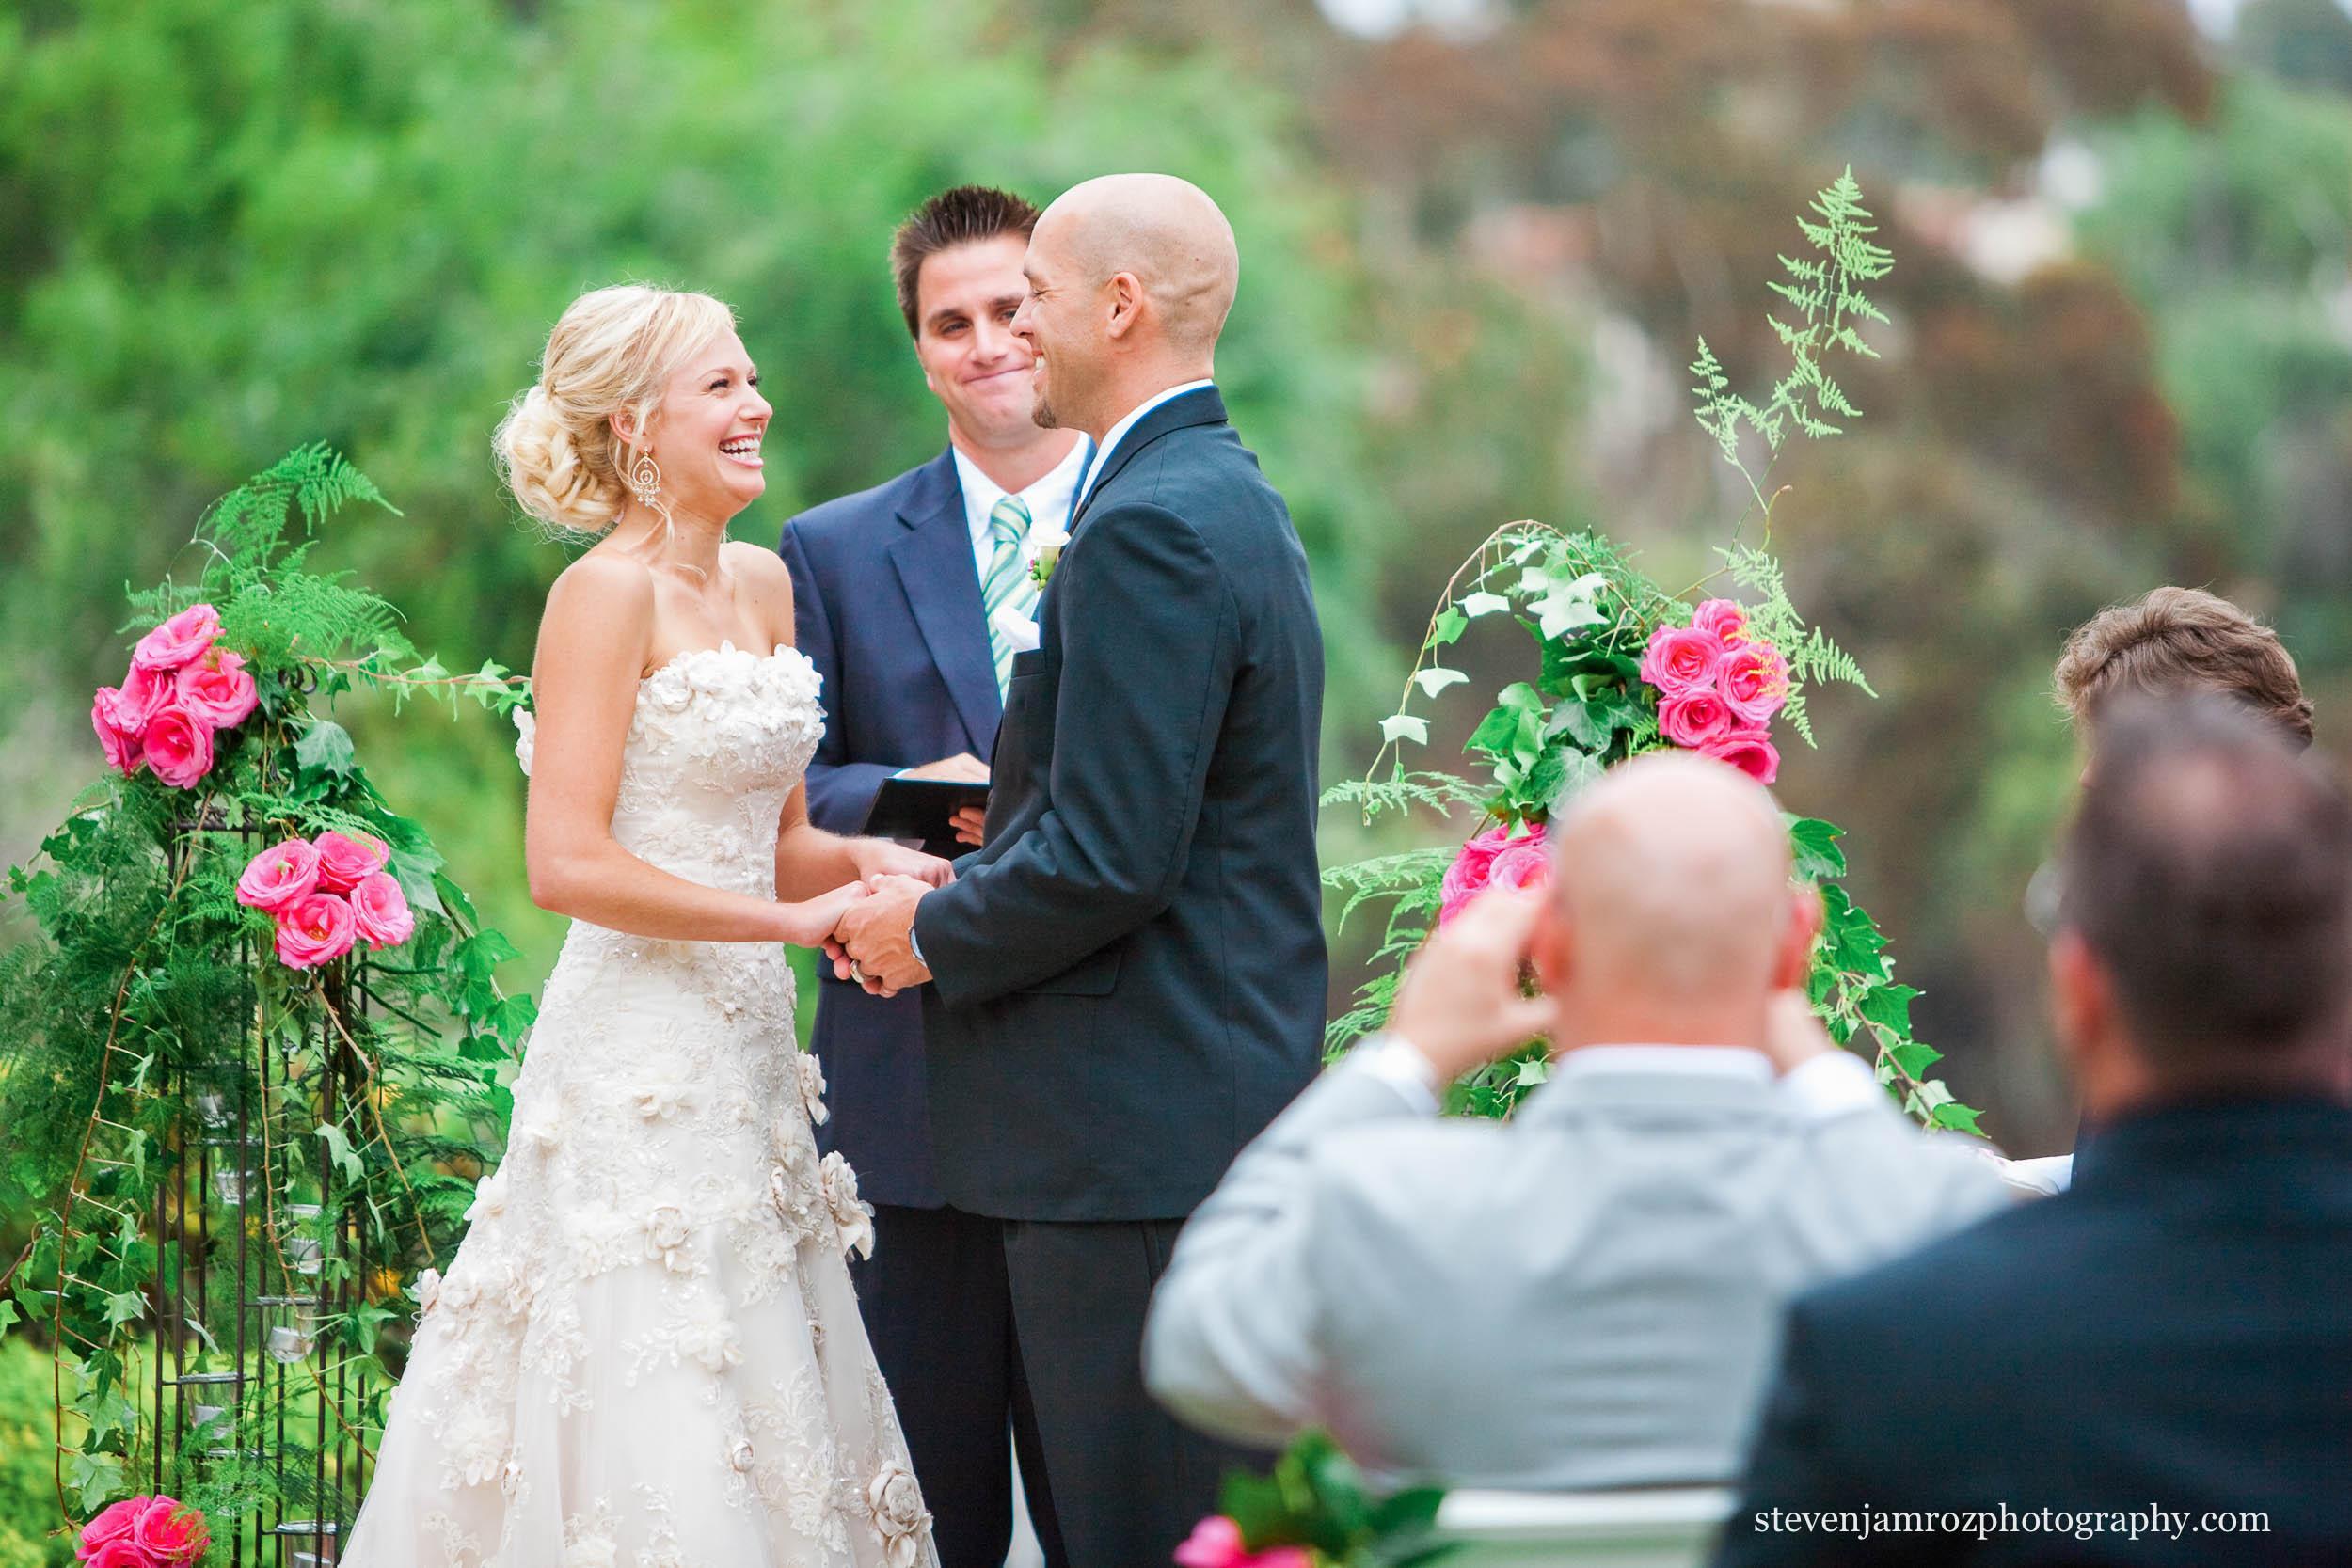 beautiful-wedding-ceremony-durham-nc-wedding-venues-0845.jpg